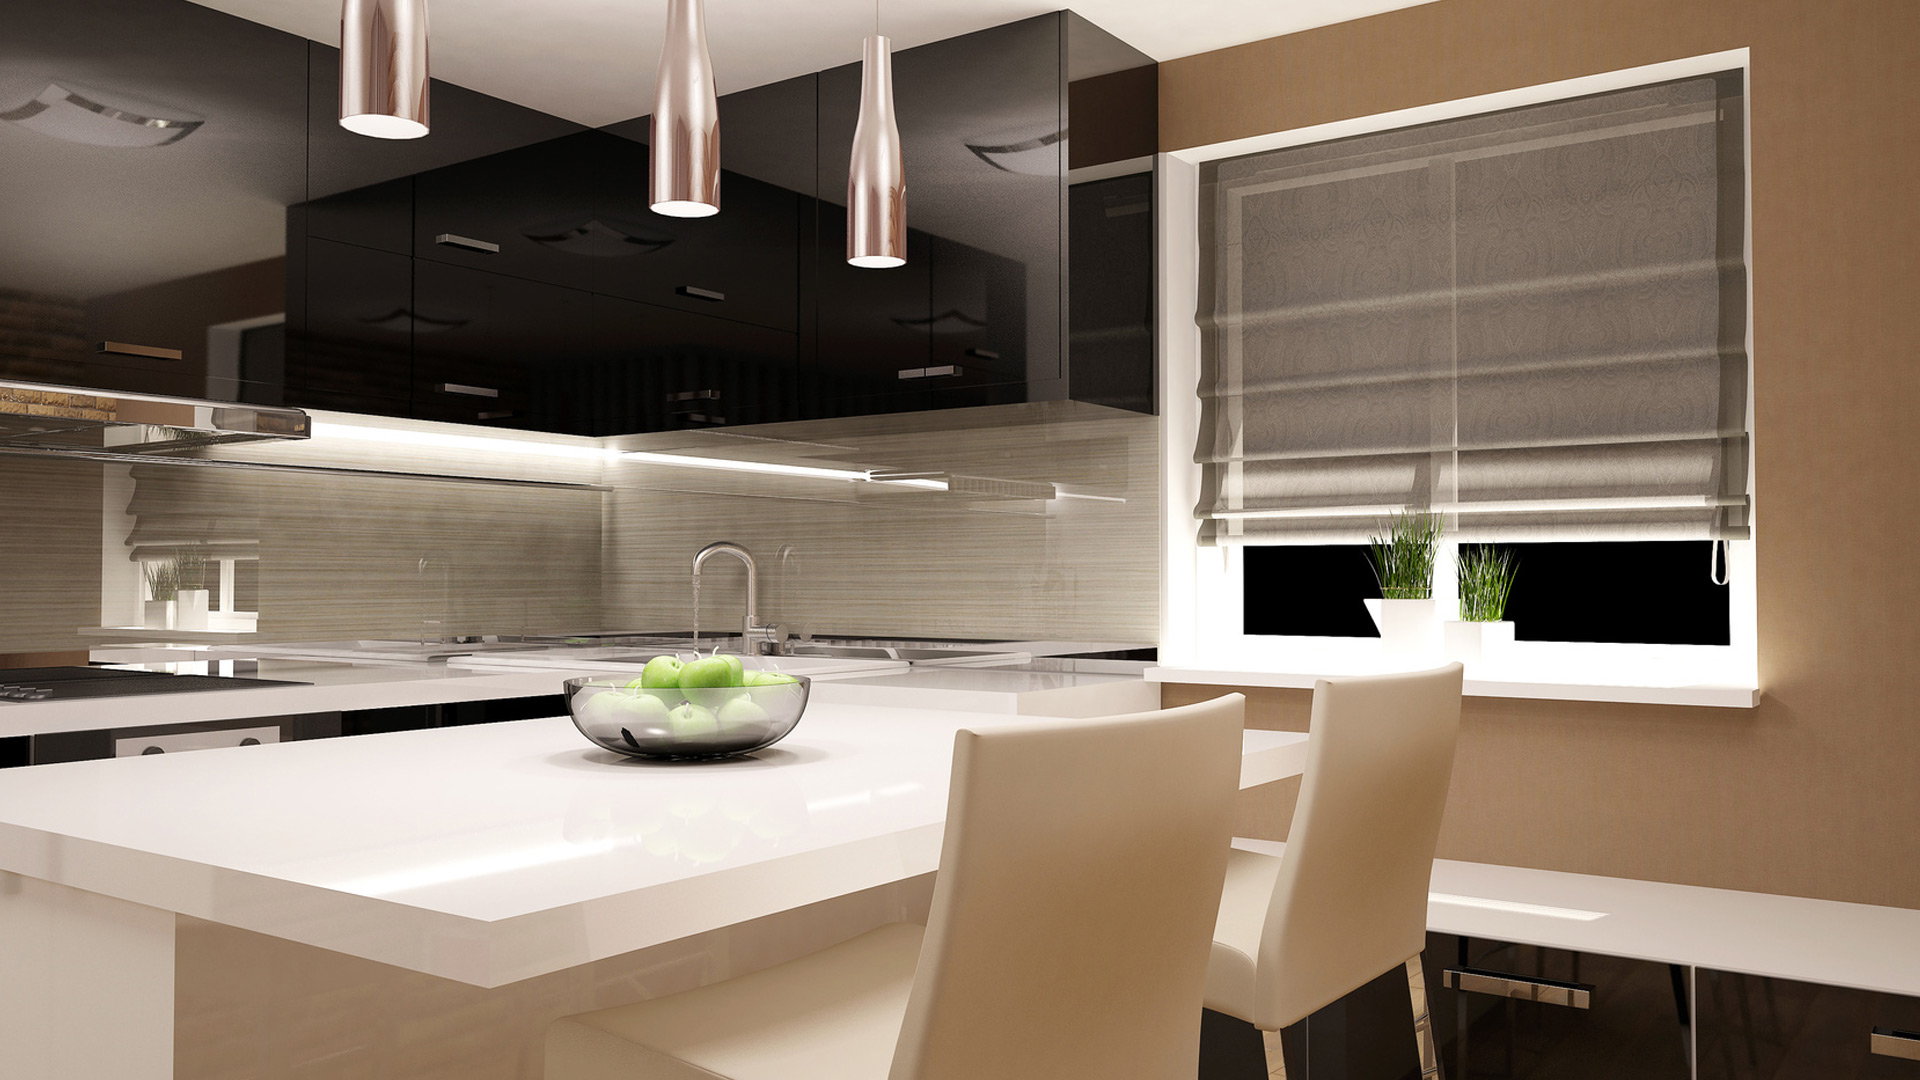 Kitchen Cabinetes Nowoczesne Kuchnie Ramani Projektowanie Mebli Kuchennych